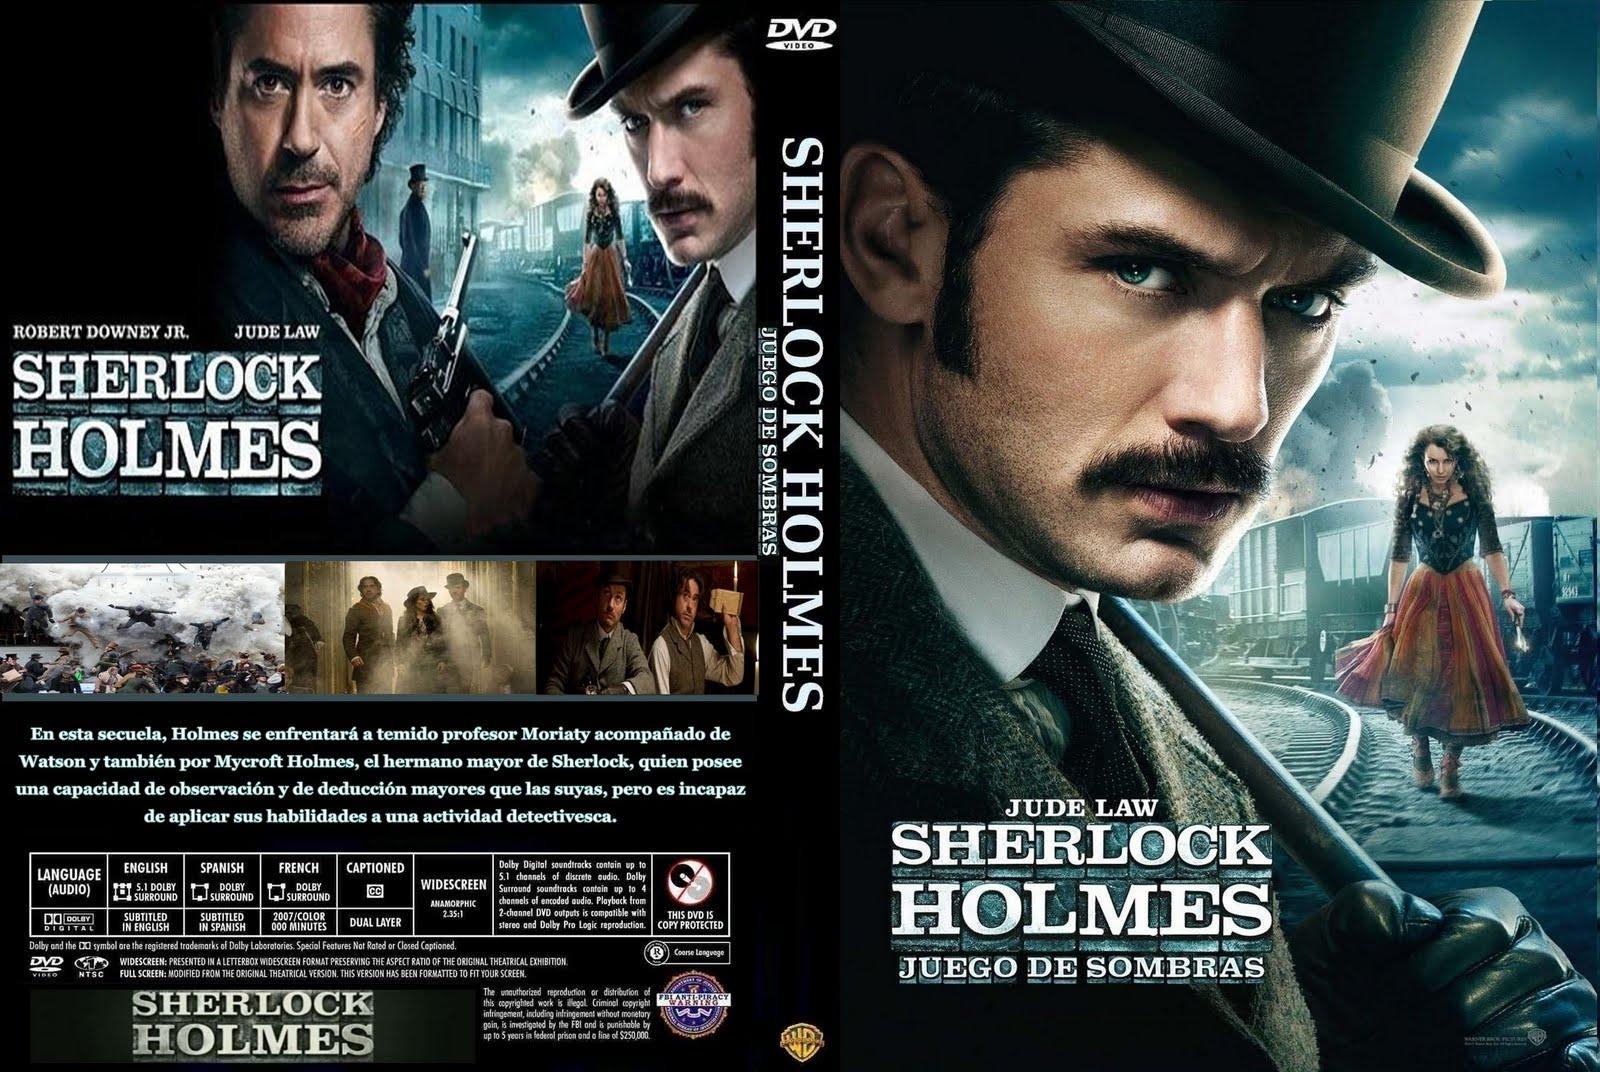 http://3.bp.blogspot.com/-JaeBRs-qWOA/T6a3RsPvdAI/AAAAAAAABYw/mEEzvxXP7Vg/s1600/Sherlock+Holmes+Juego+De+Sombras+Custom+Por+Oraldo1987+-+dvd.jpg